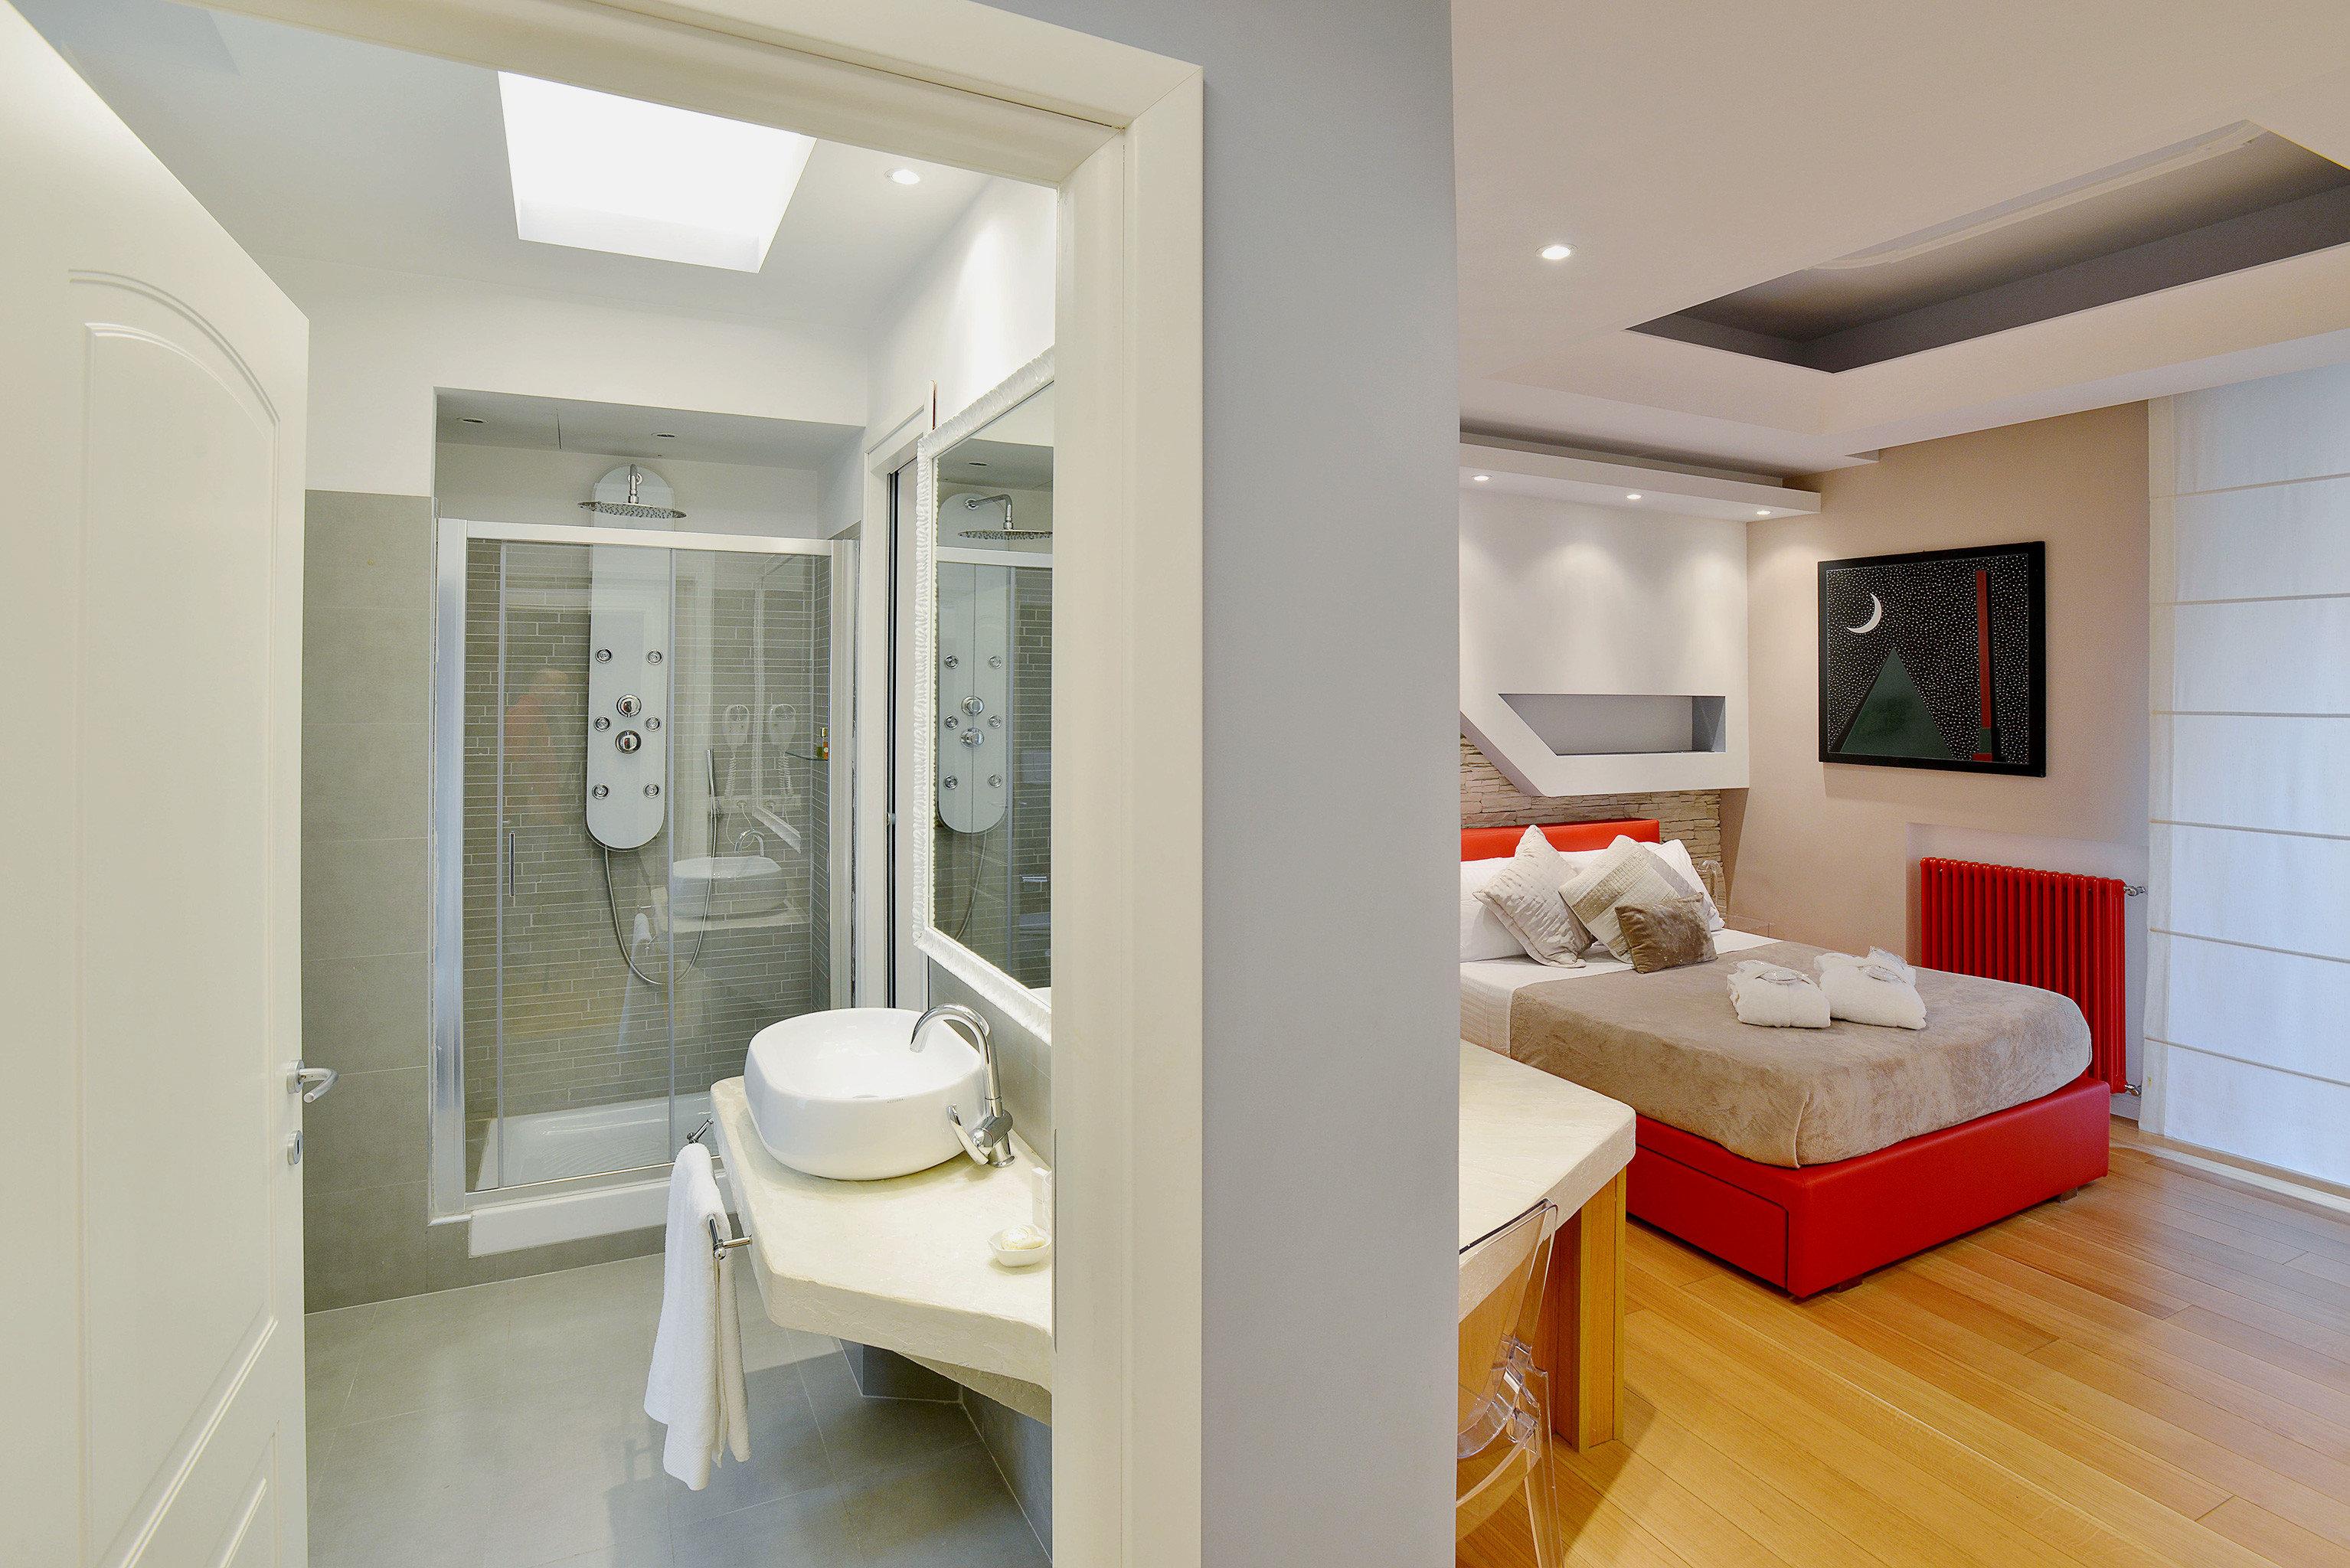 B&B Bath Bedroom City bathroom property home living room cottage